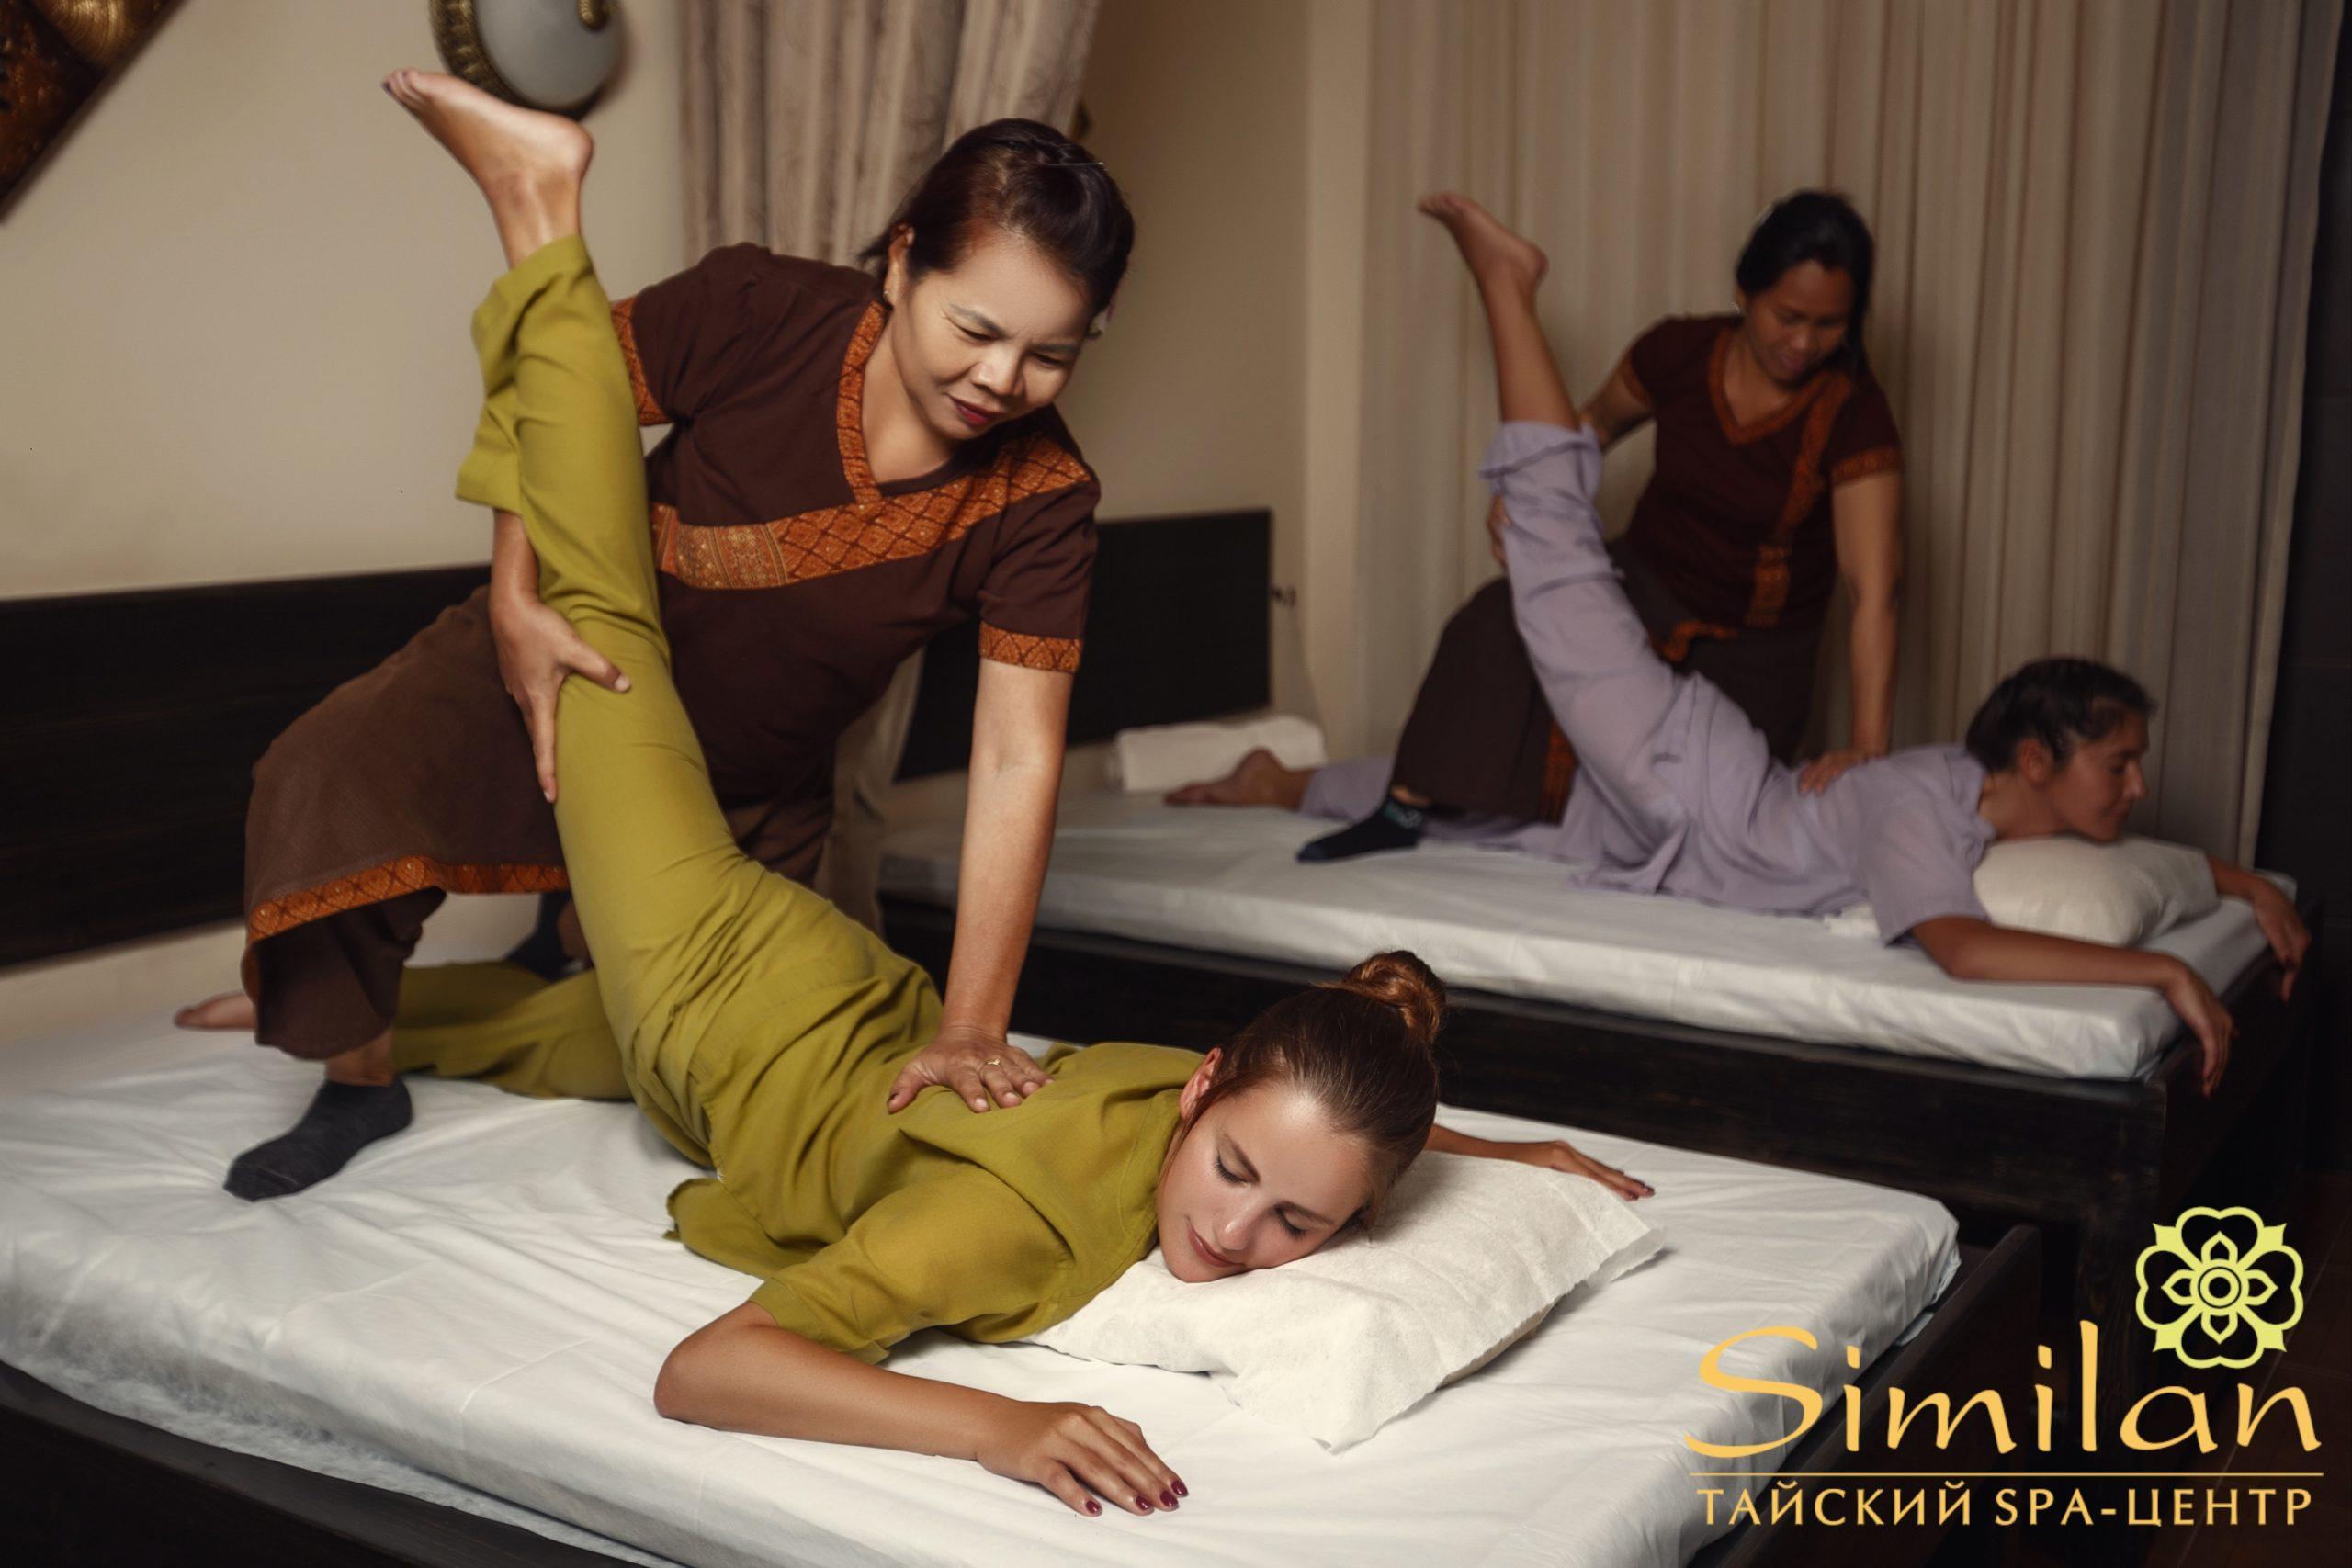 Erotic massage hamilton on massage sexy thai emily howden photography